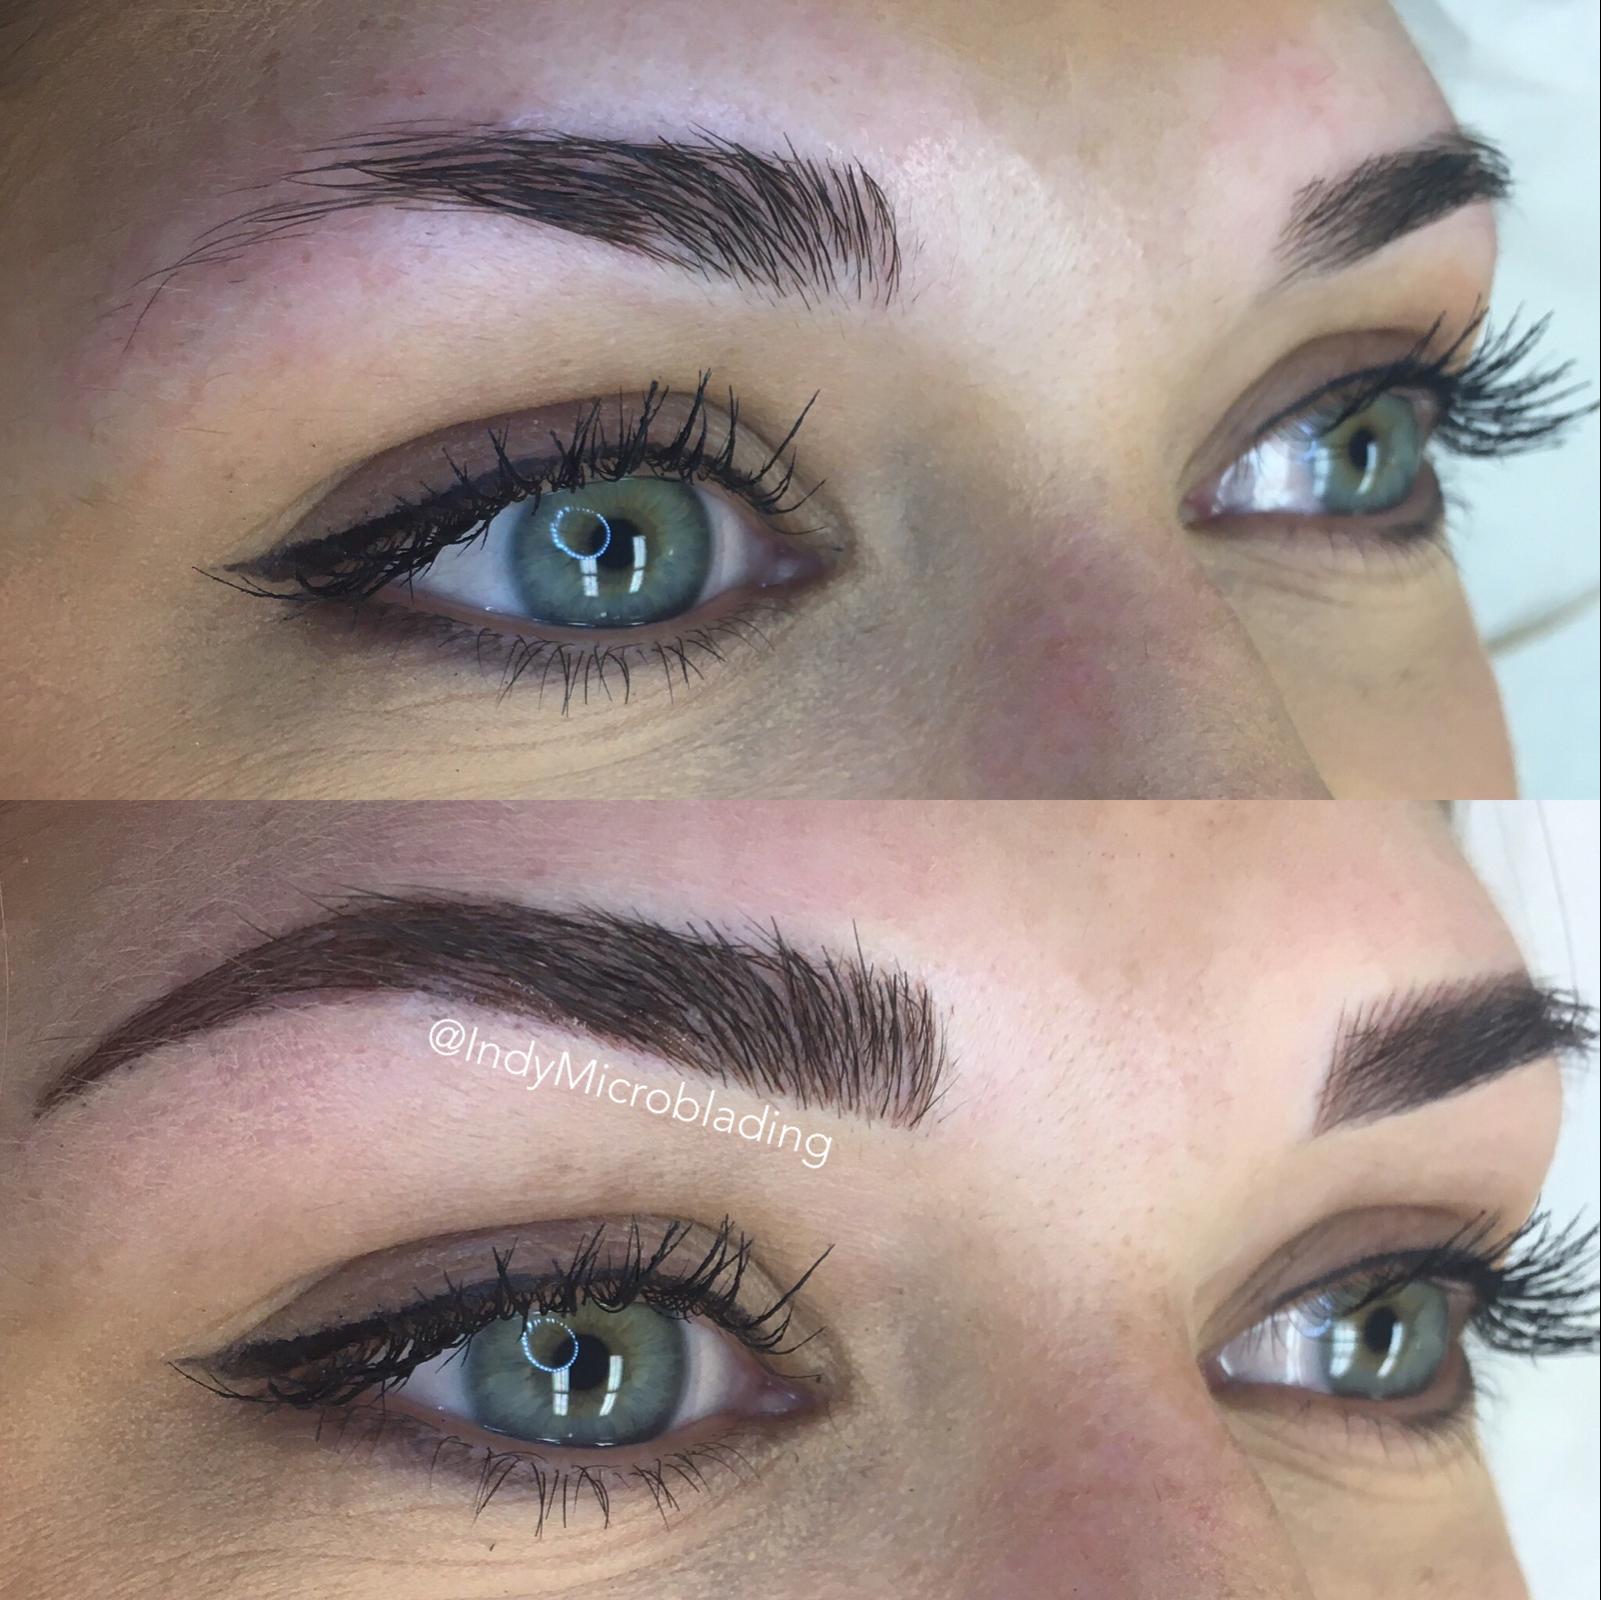 Henna Tattoo Eyebrow Course: Indy Microblading, Eyebrows On Fleek, Microblading